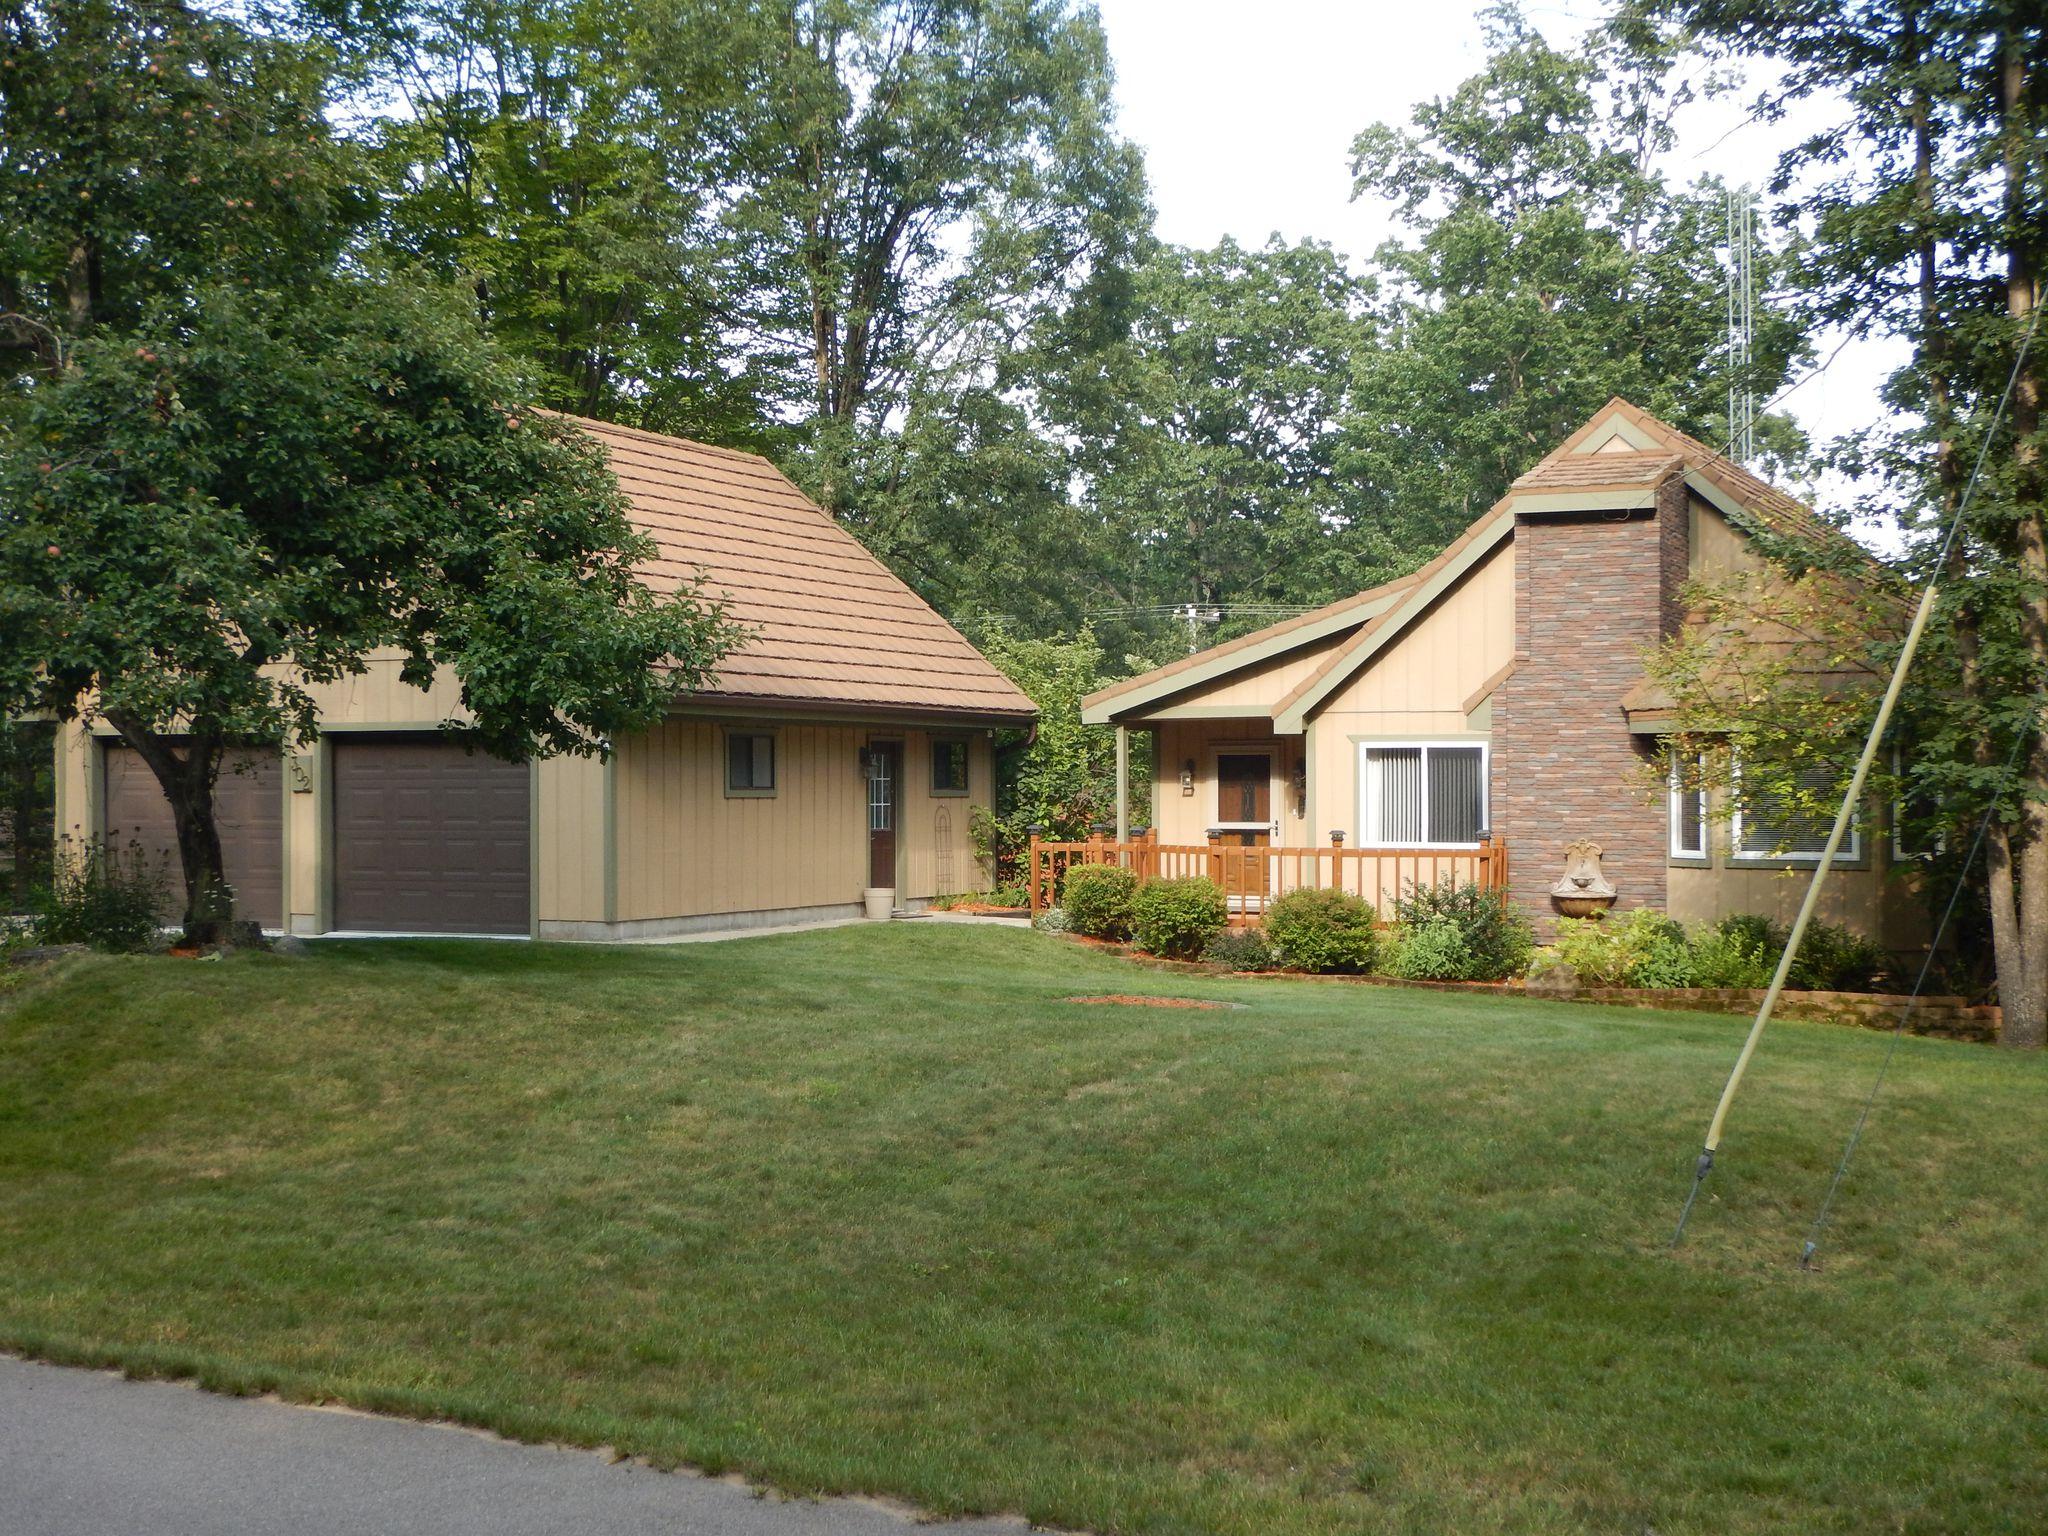 302 ridgedale dr roscommon mi 48653 estimate and home details